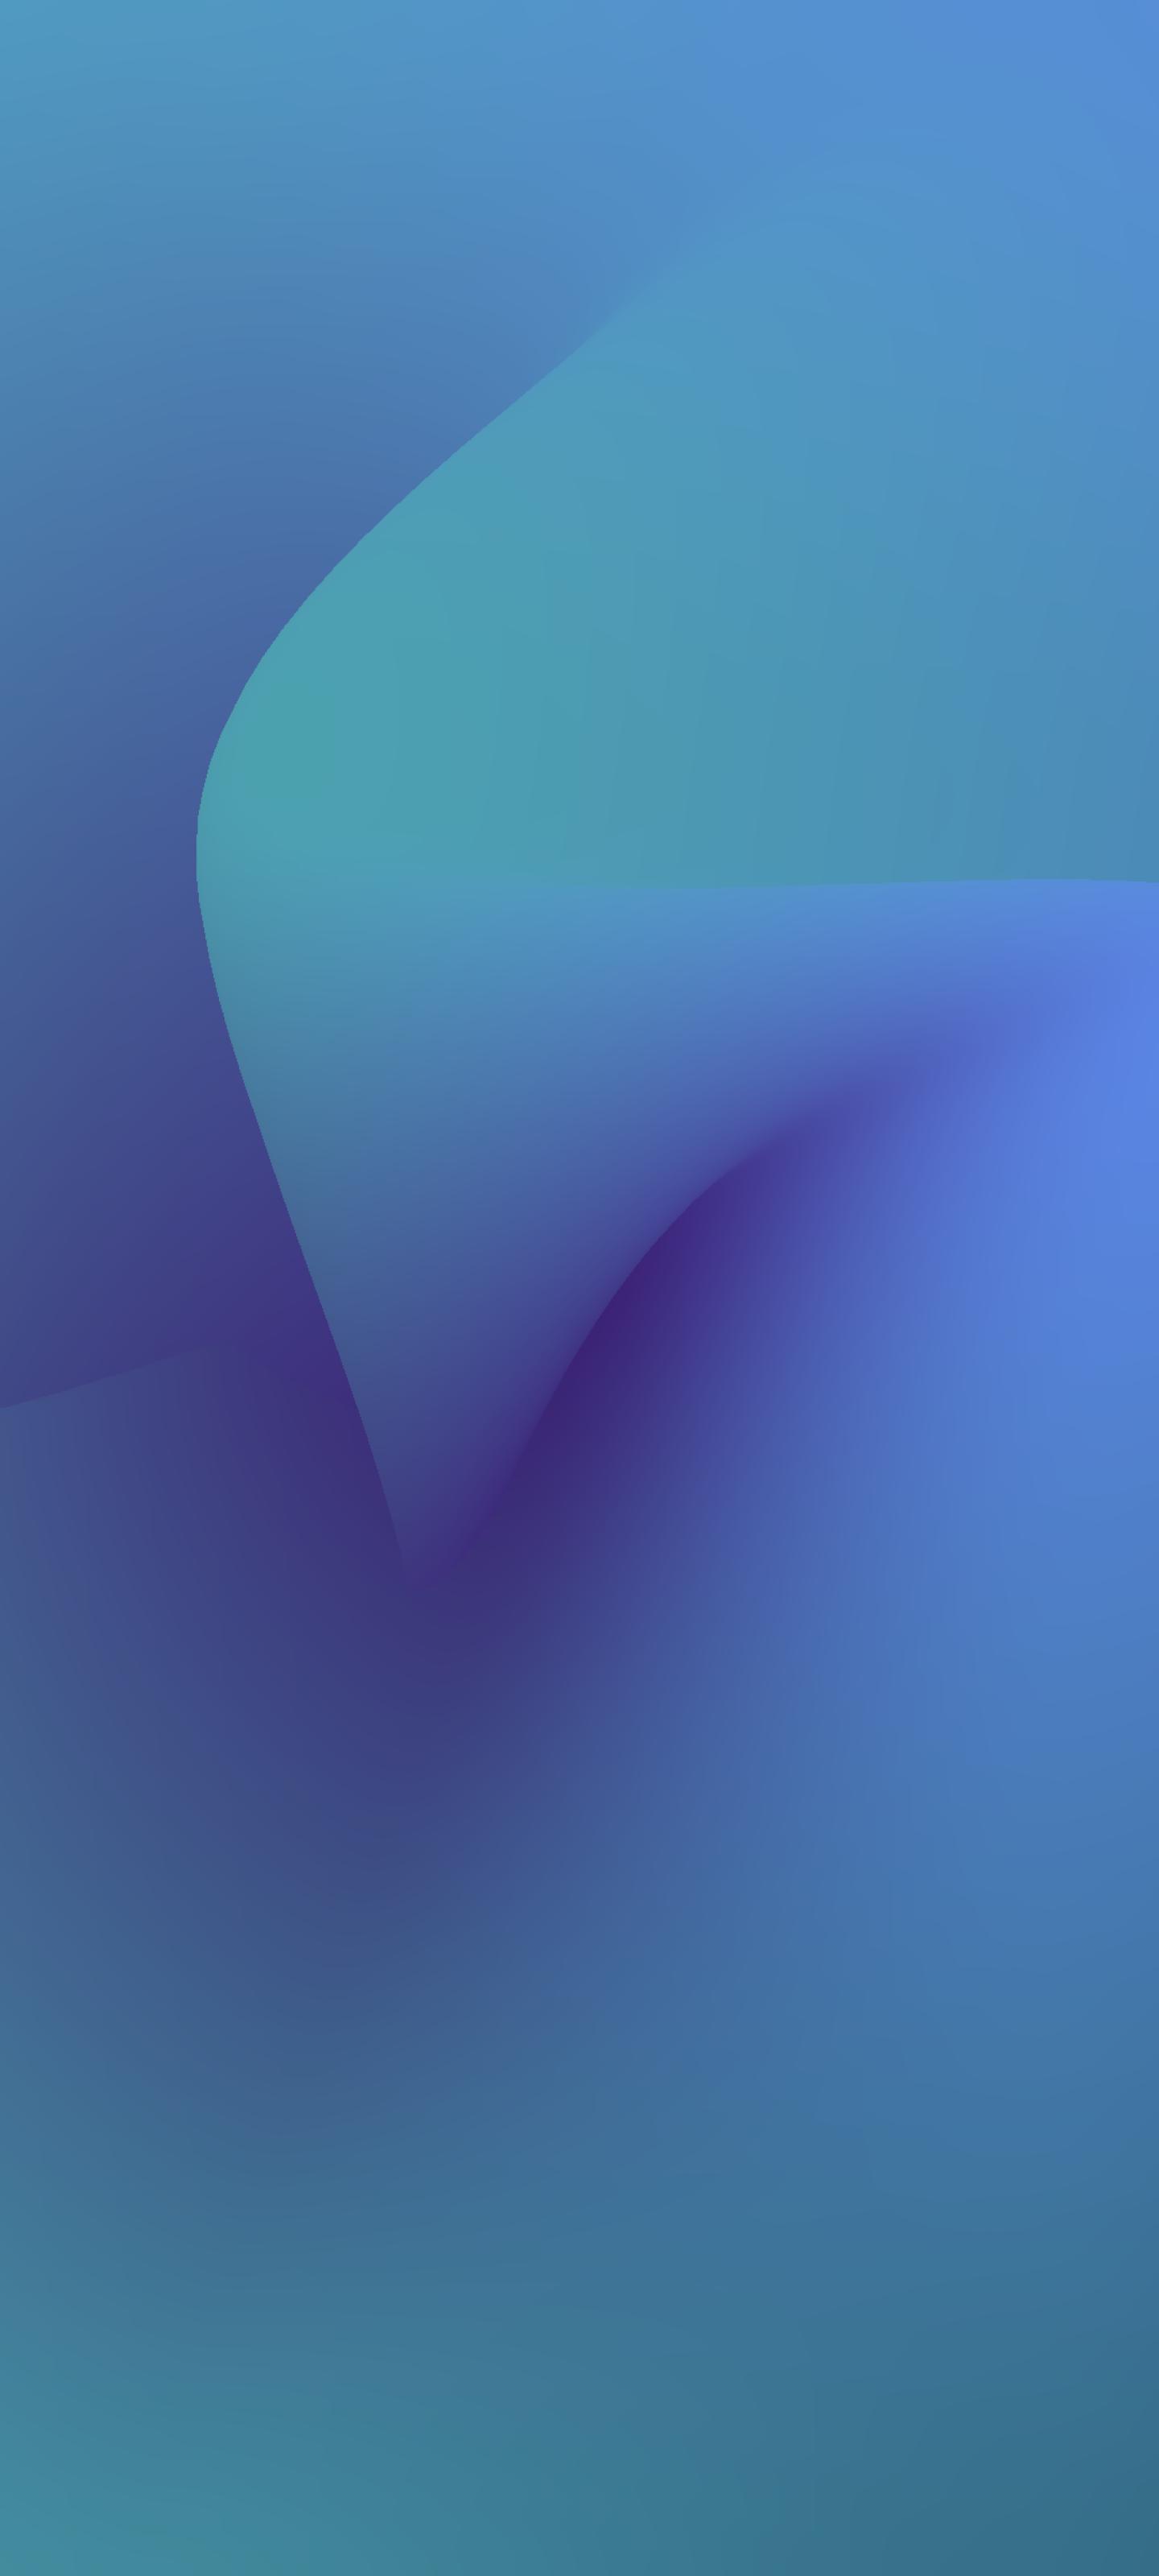 Mesh Gradient Wallpaper for iPhone idownloadblog yudhajit_ghosh Blue